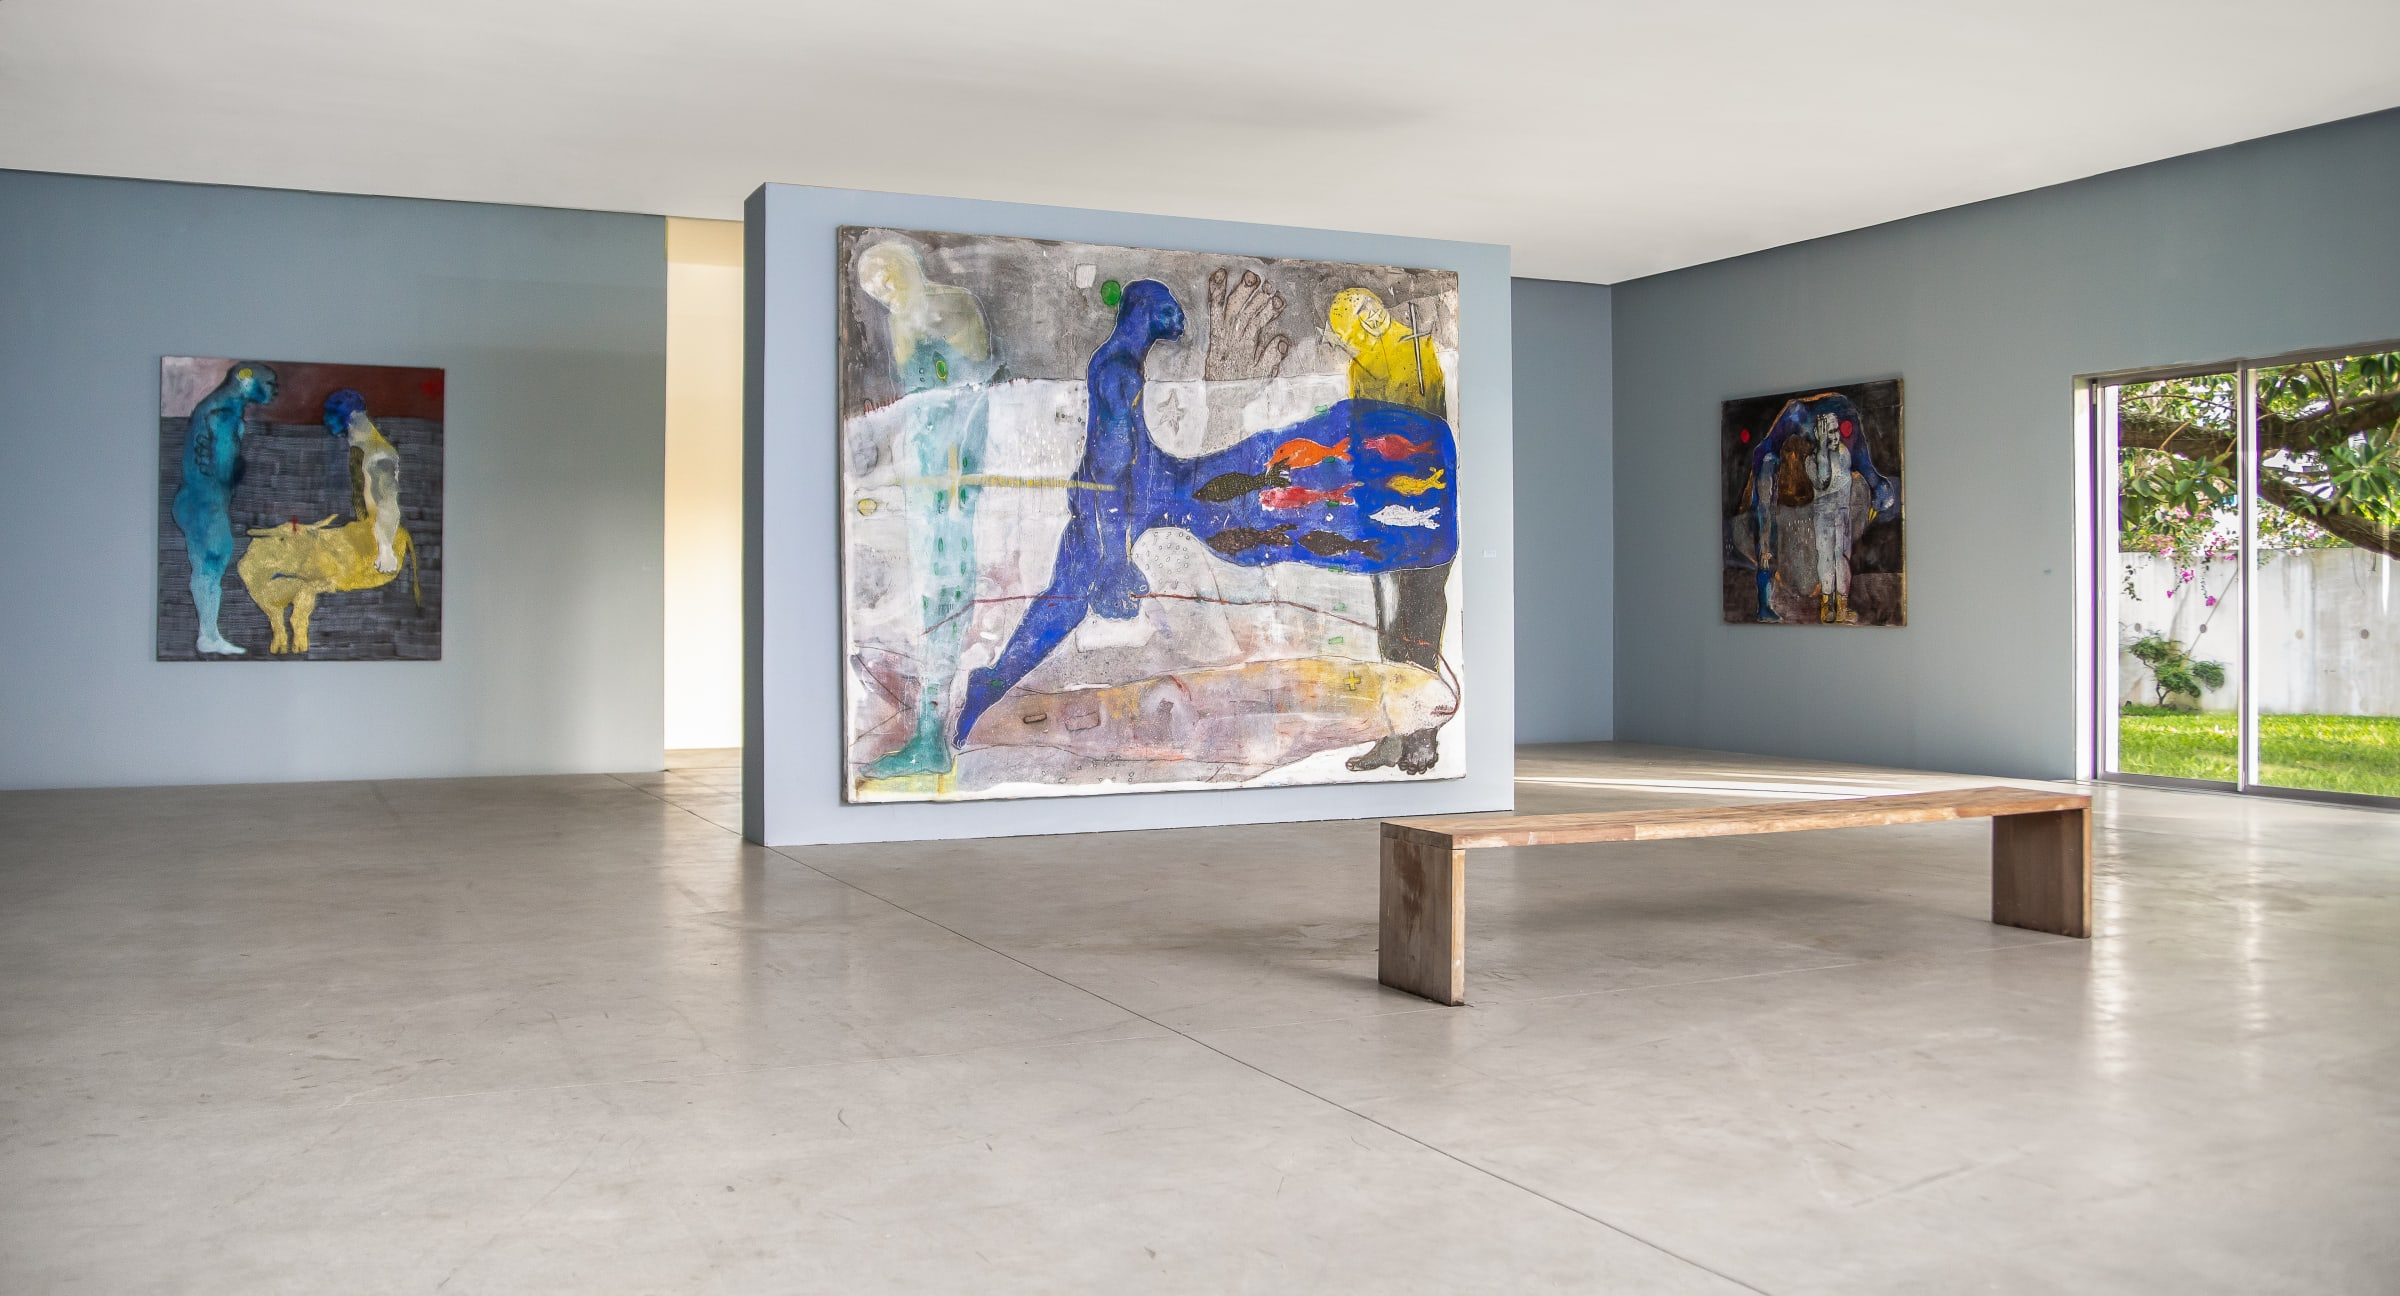 Silentium | 9 Mars - 18 Mai 2019 - Installation Views | Cécile Fakhoury